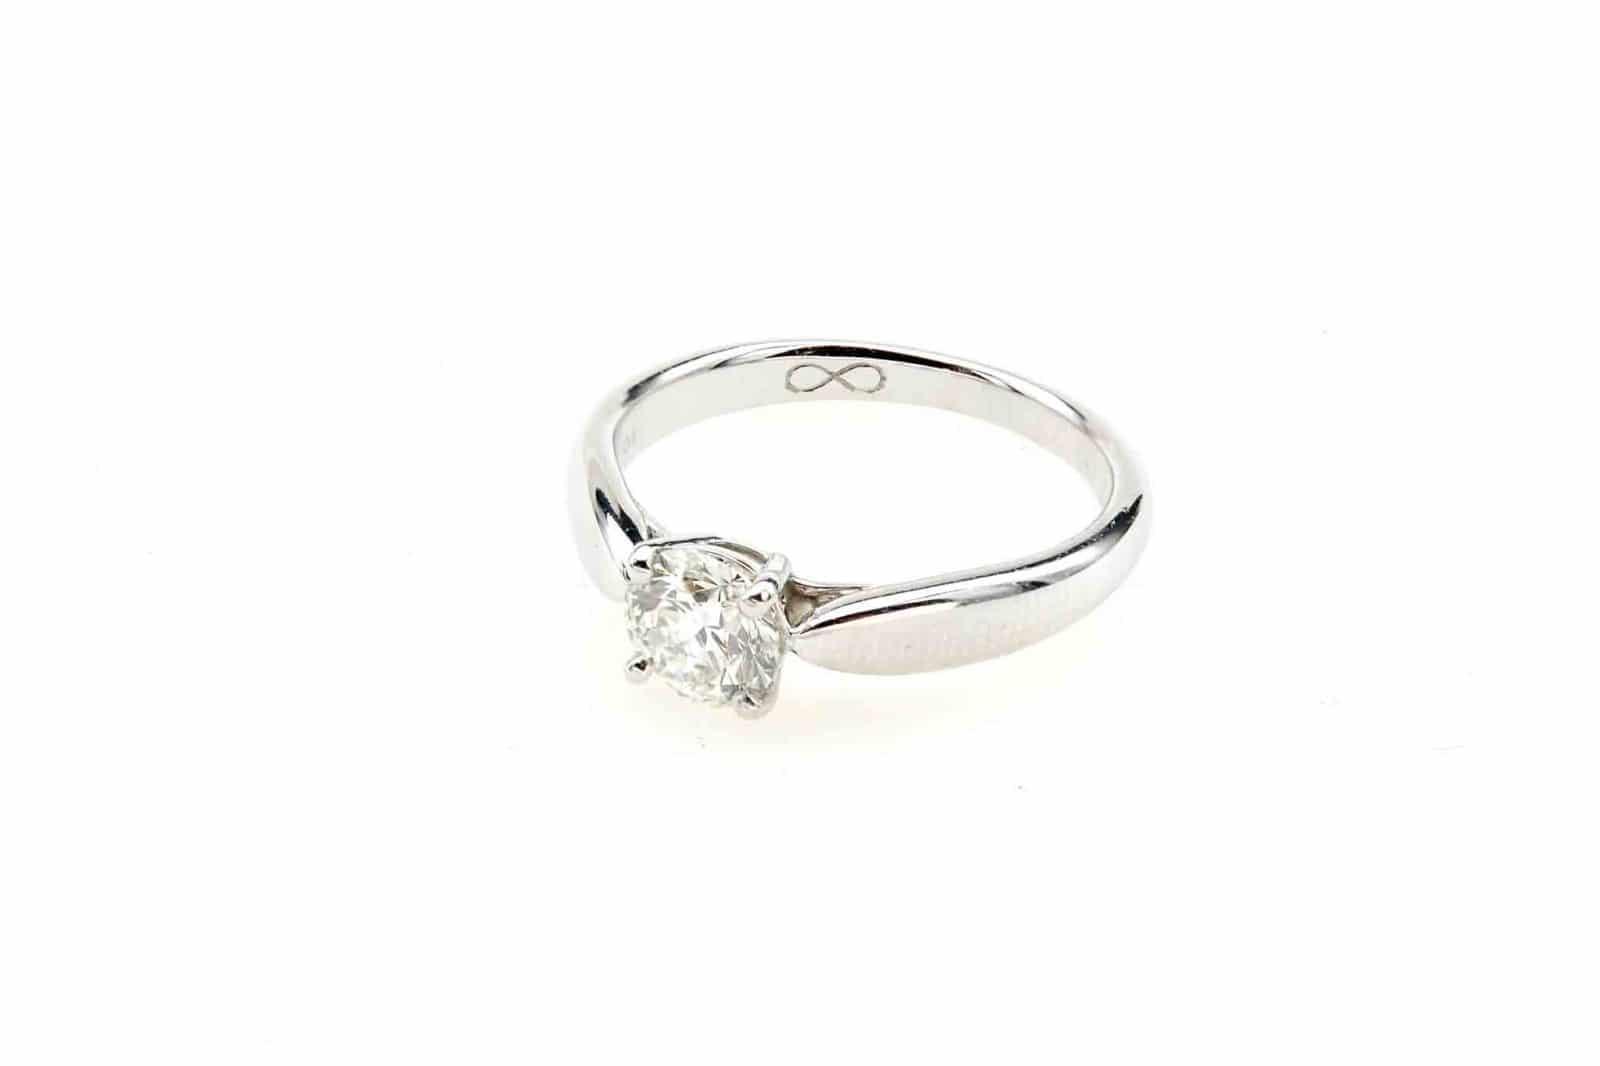 Bague solitaire diamant Tiffany